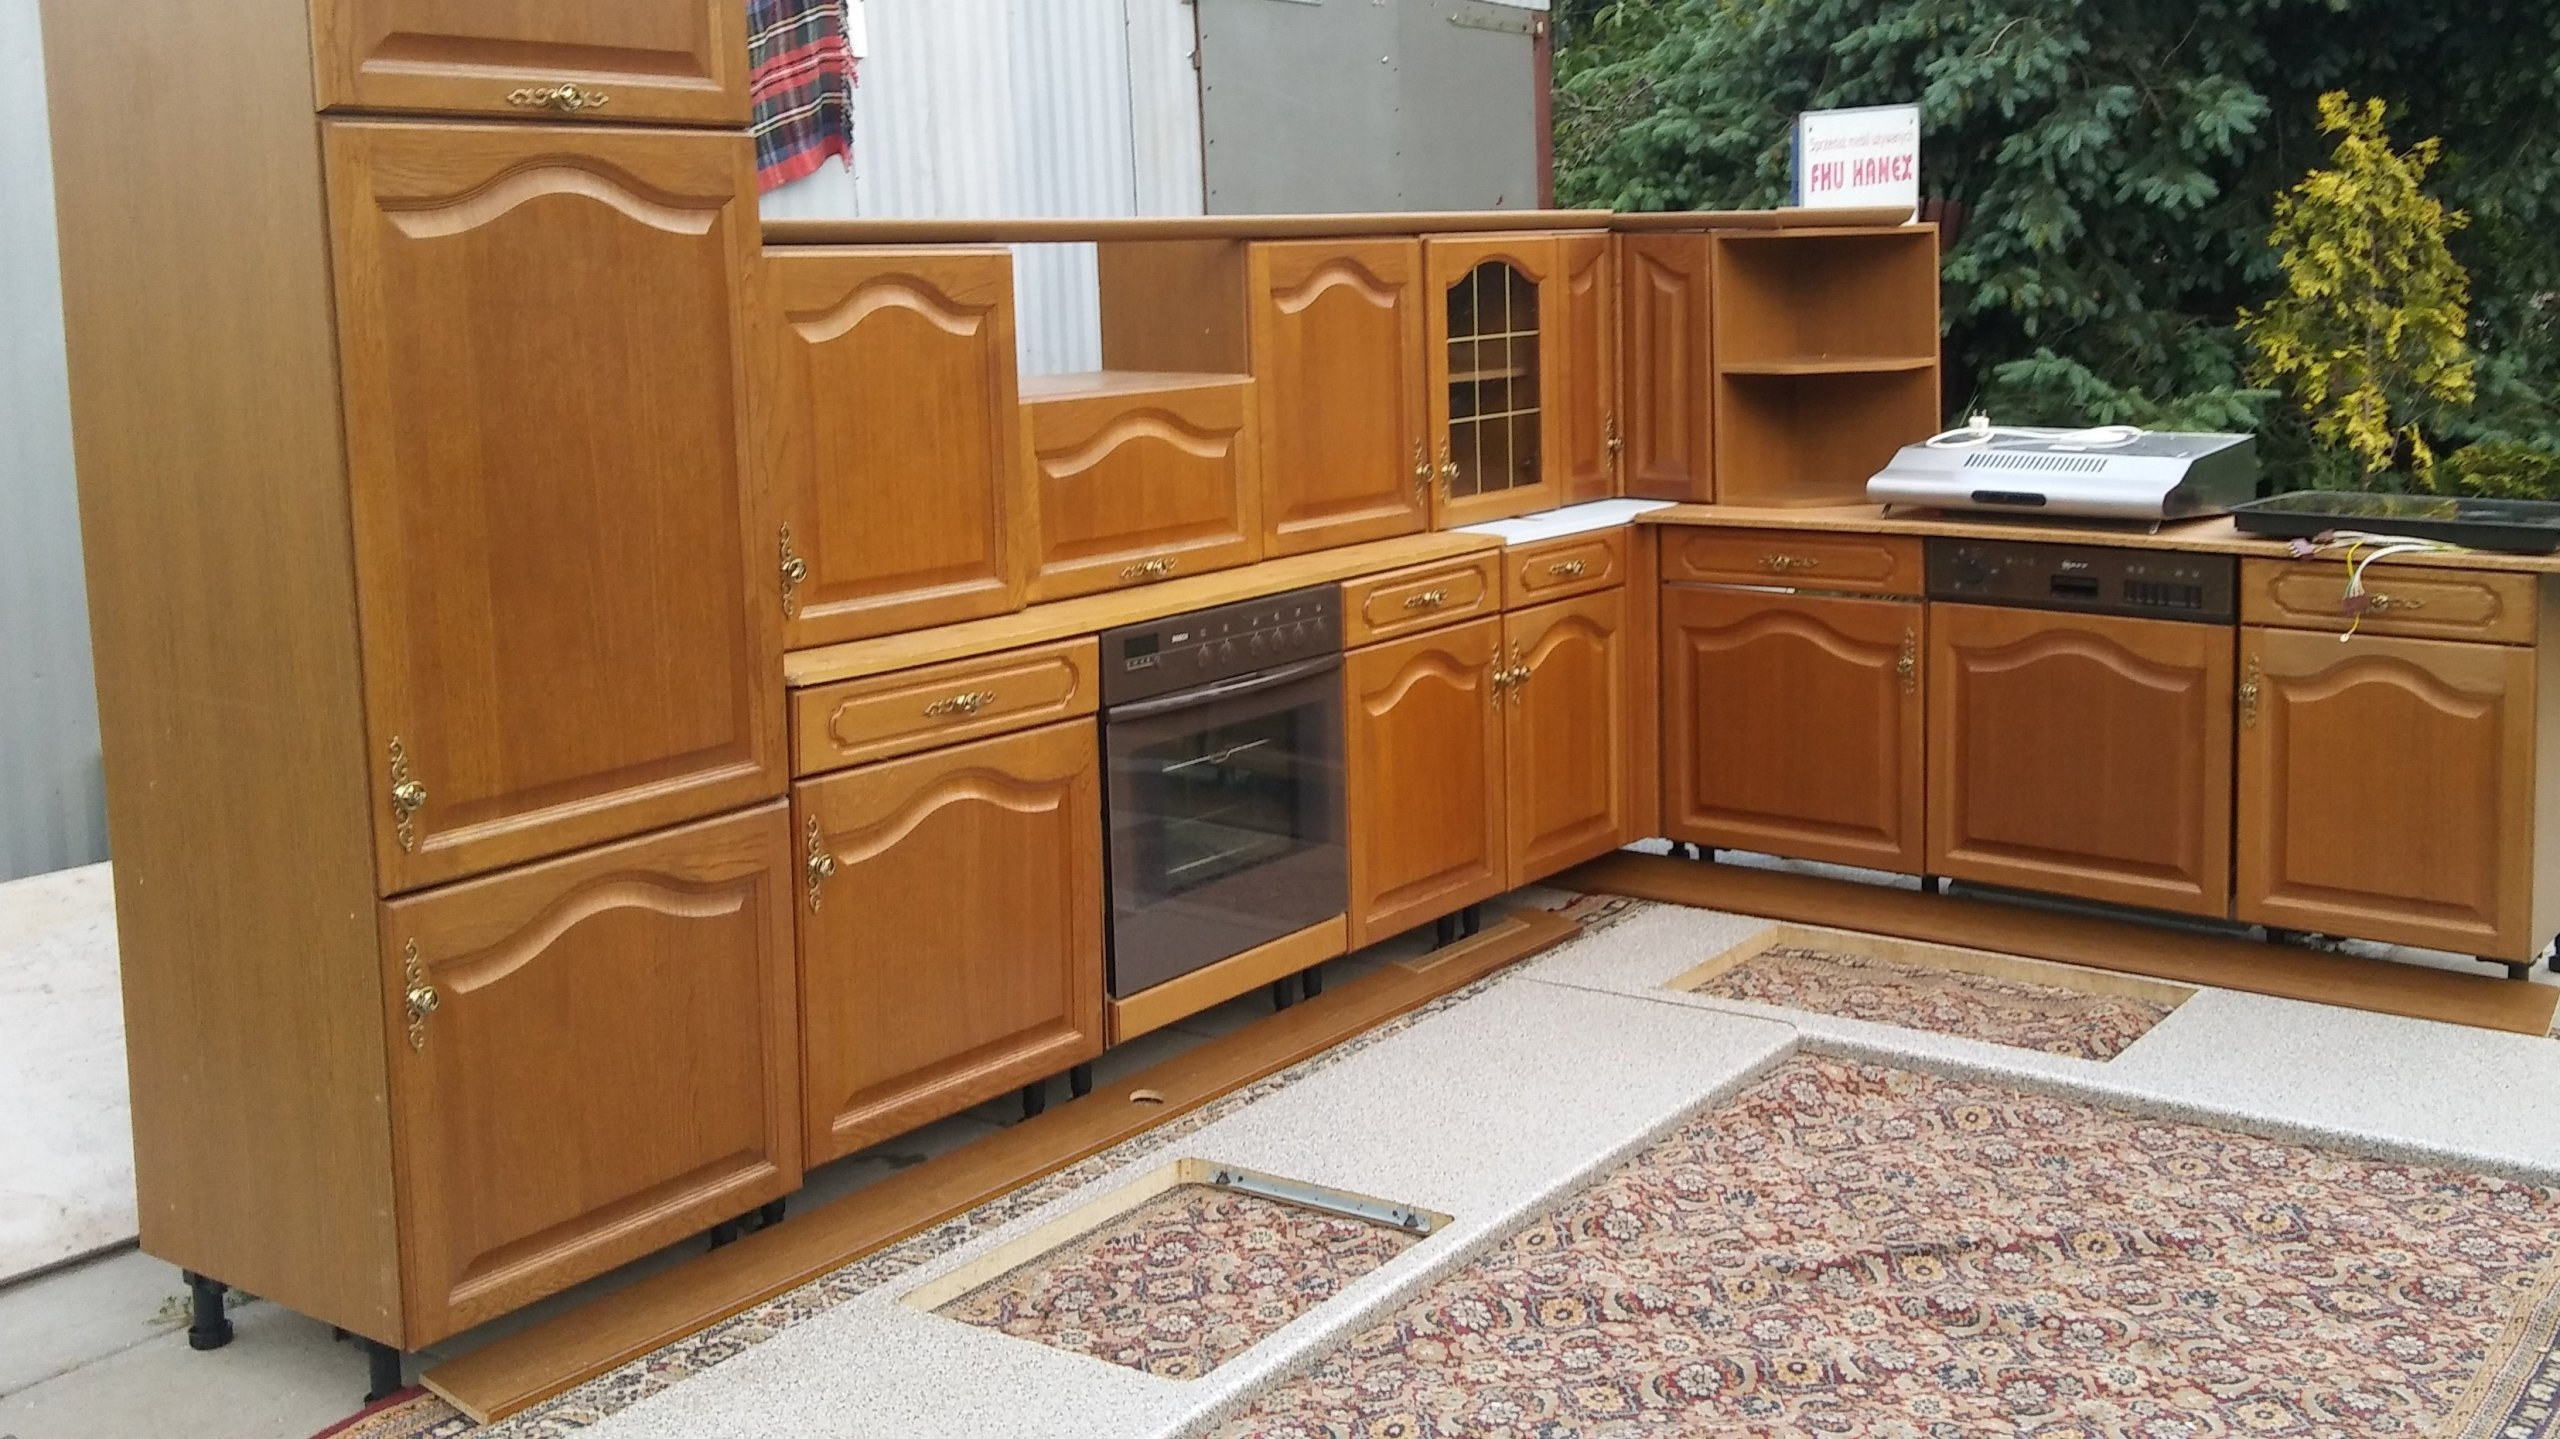 Meble Kuchenne Drewno Front Dab 7389208597 Oficjalne Archiwum